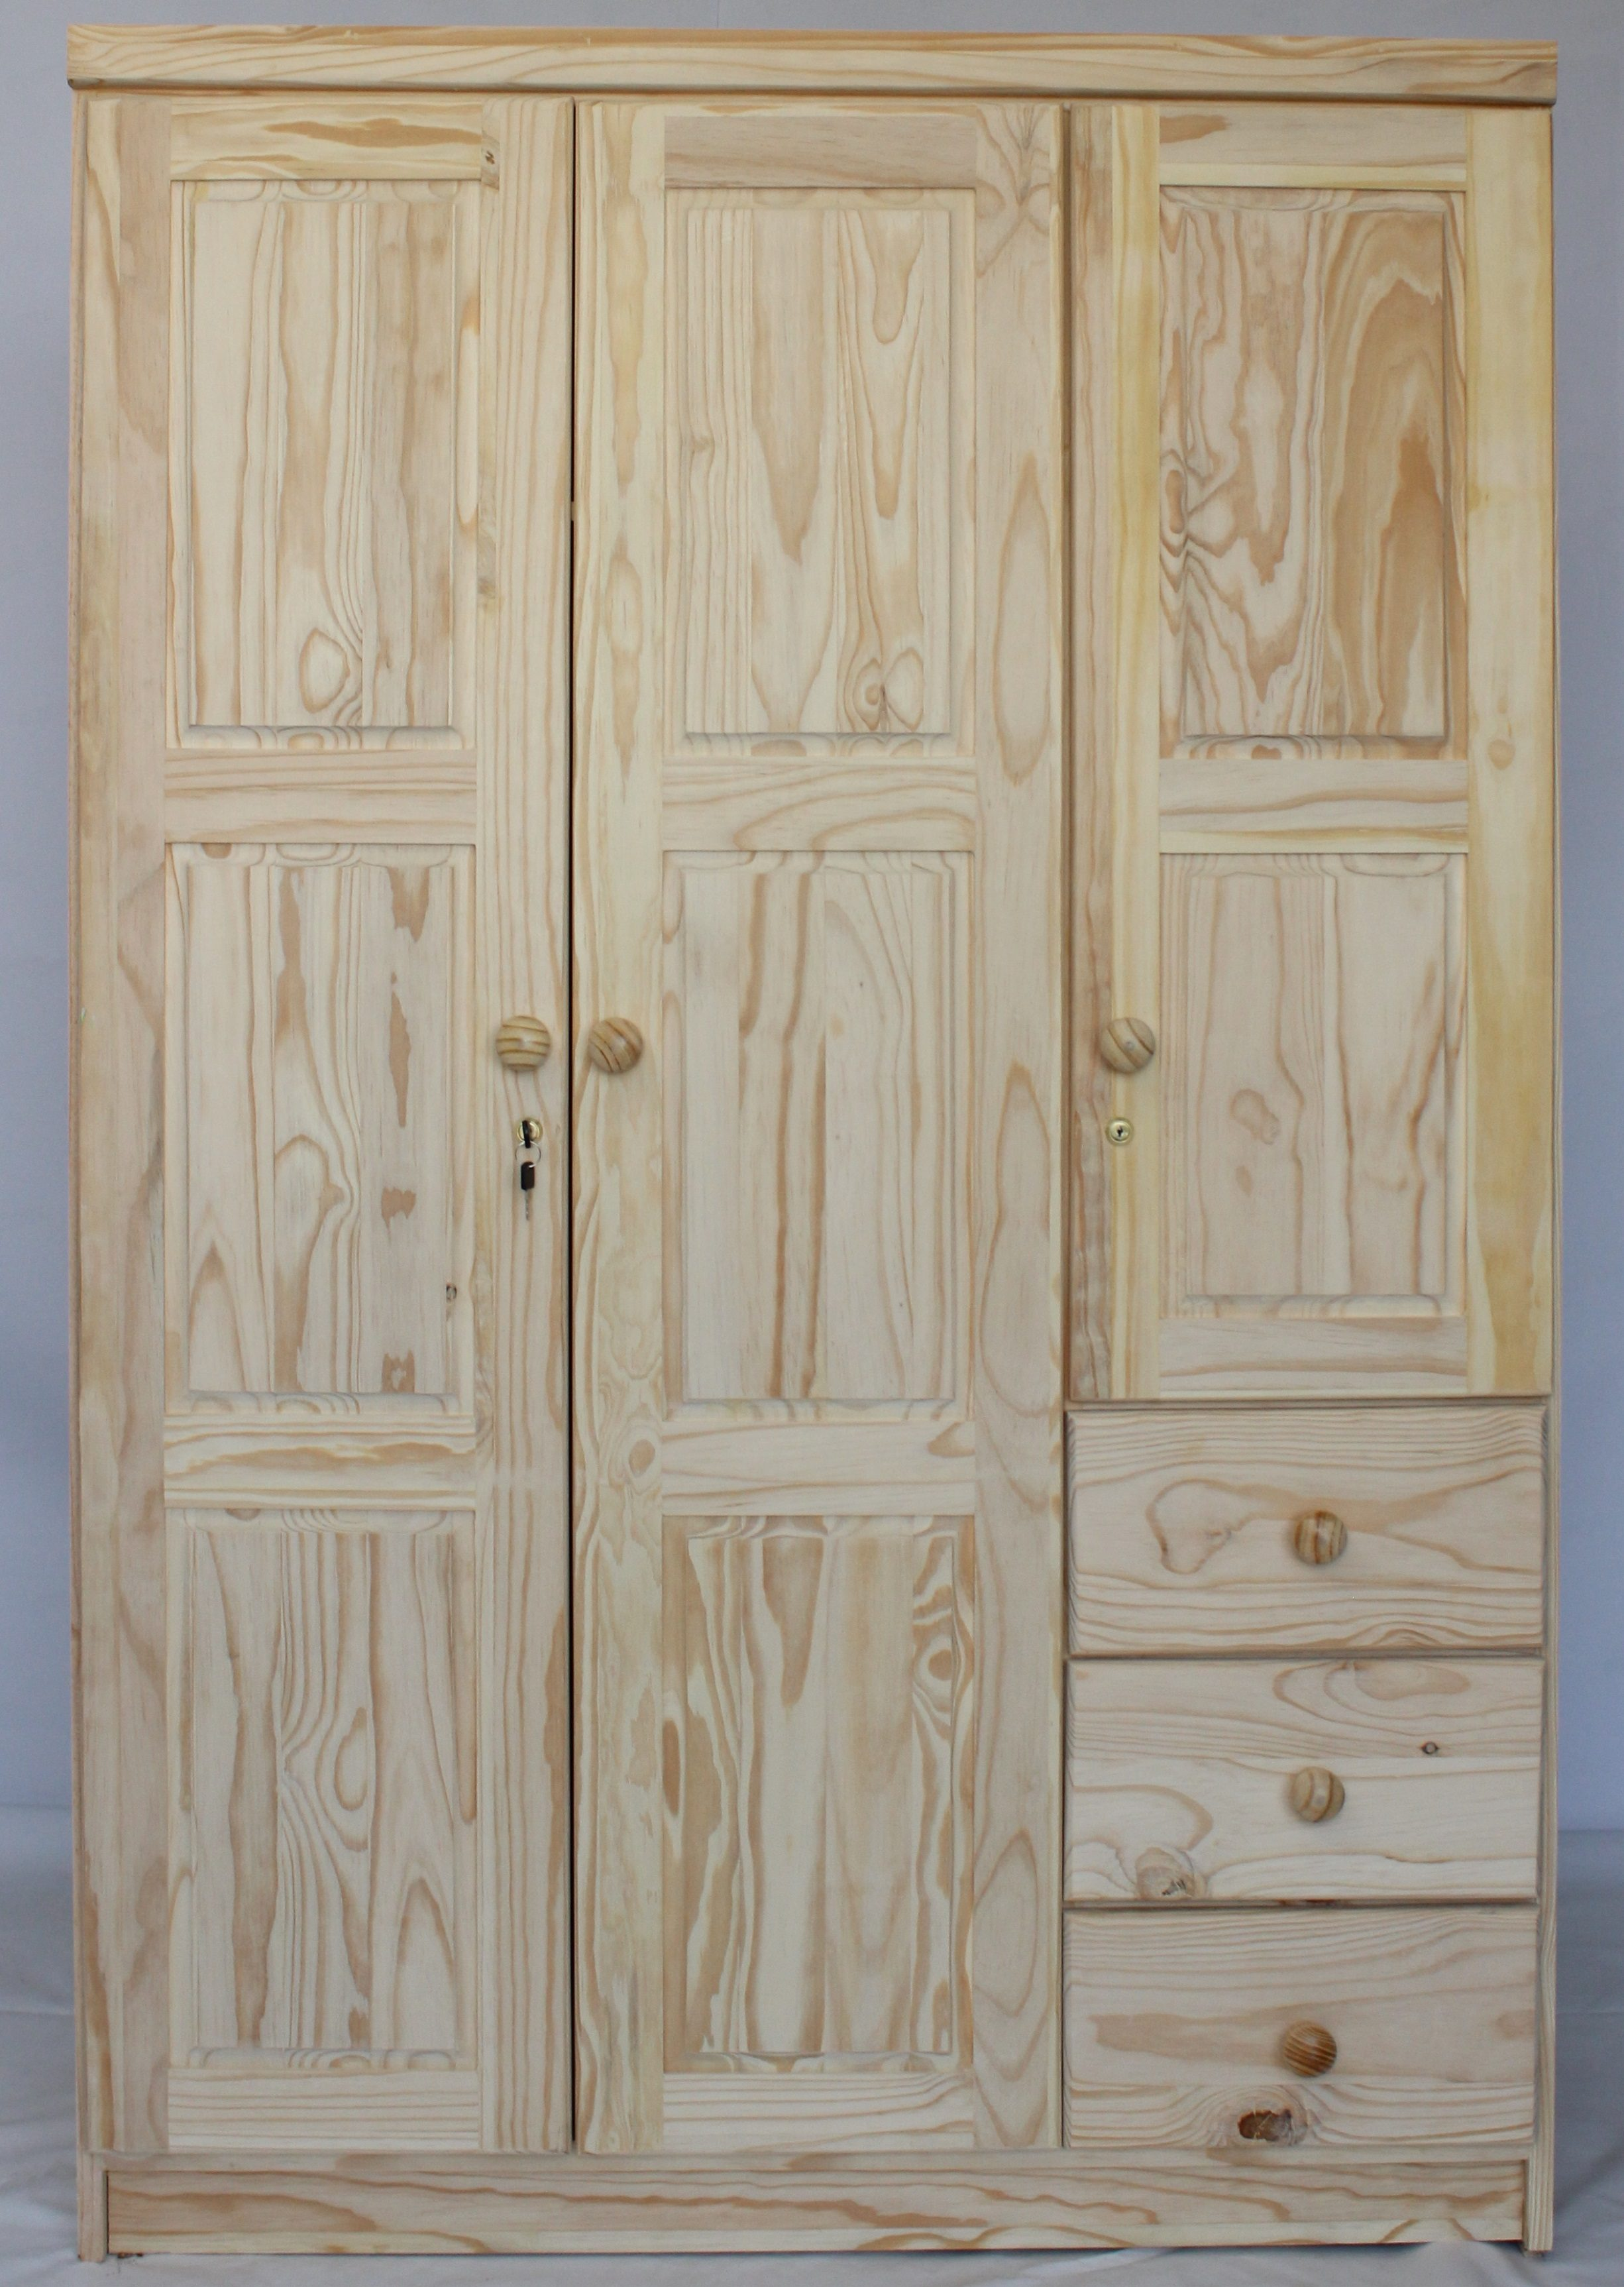 3 Door Robe with Drawers